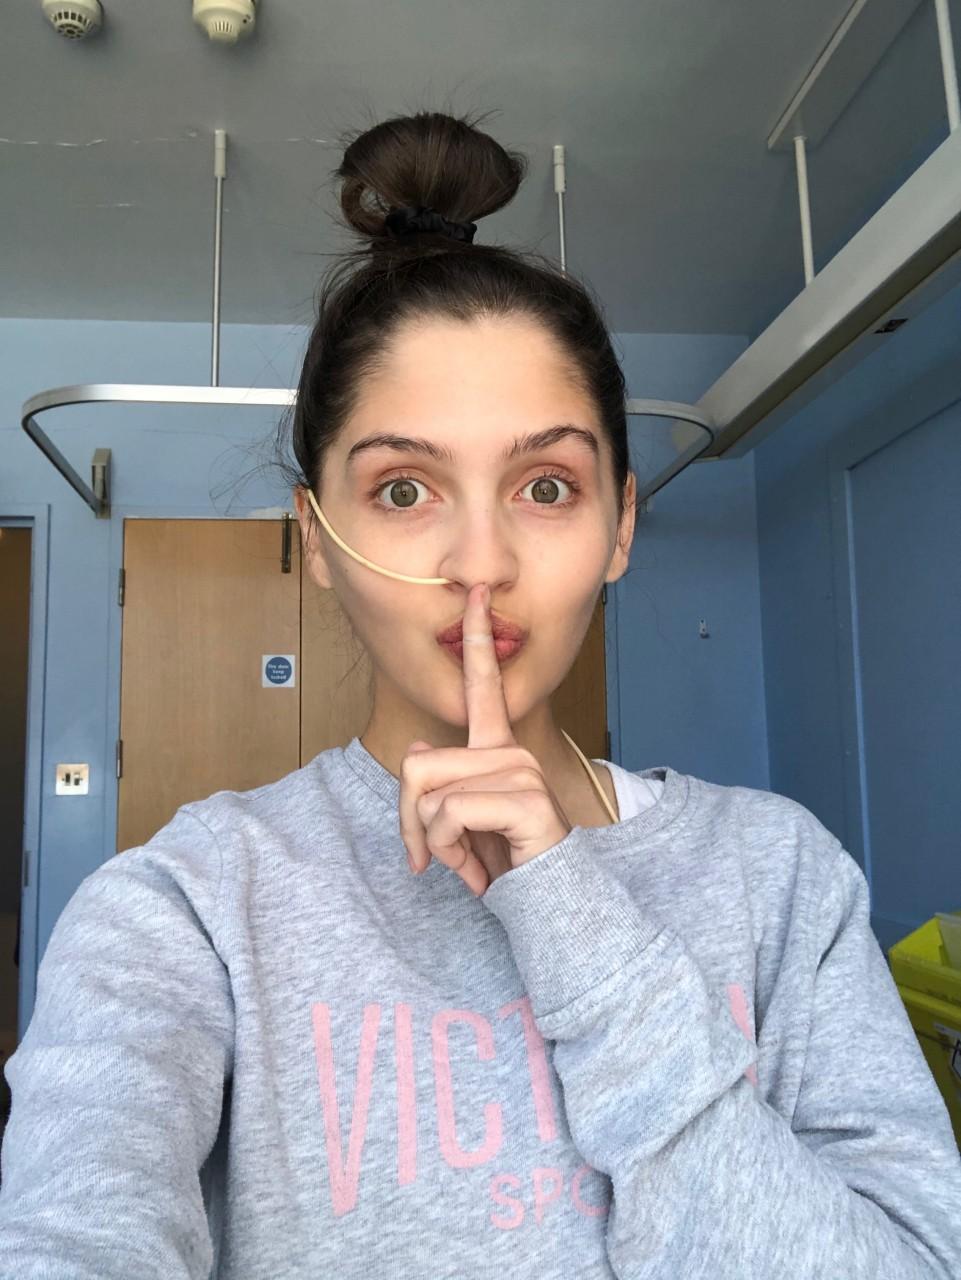 Pssst can you keep a secret??